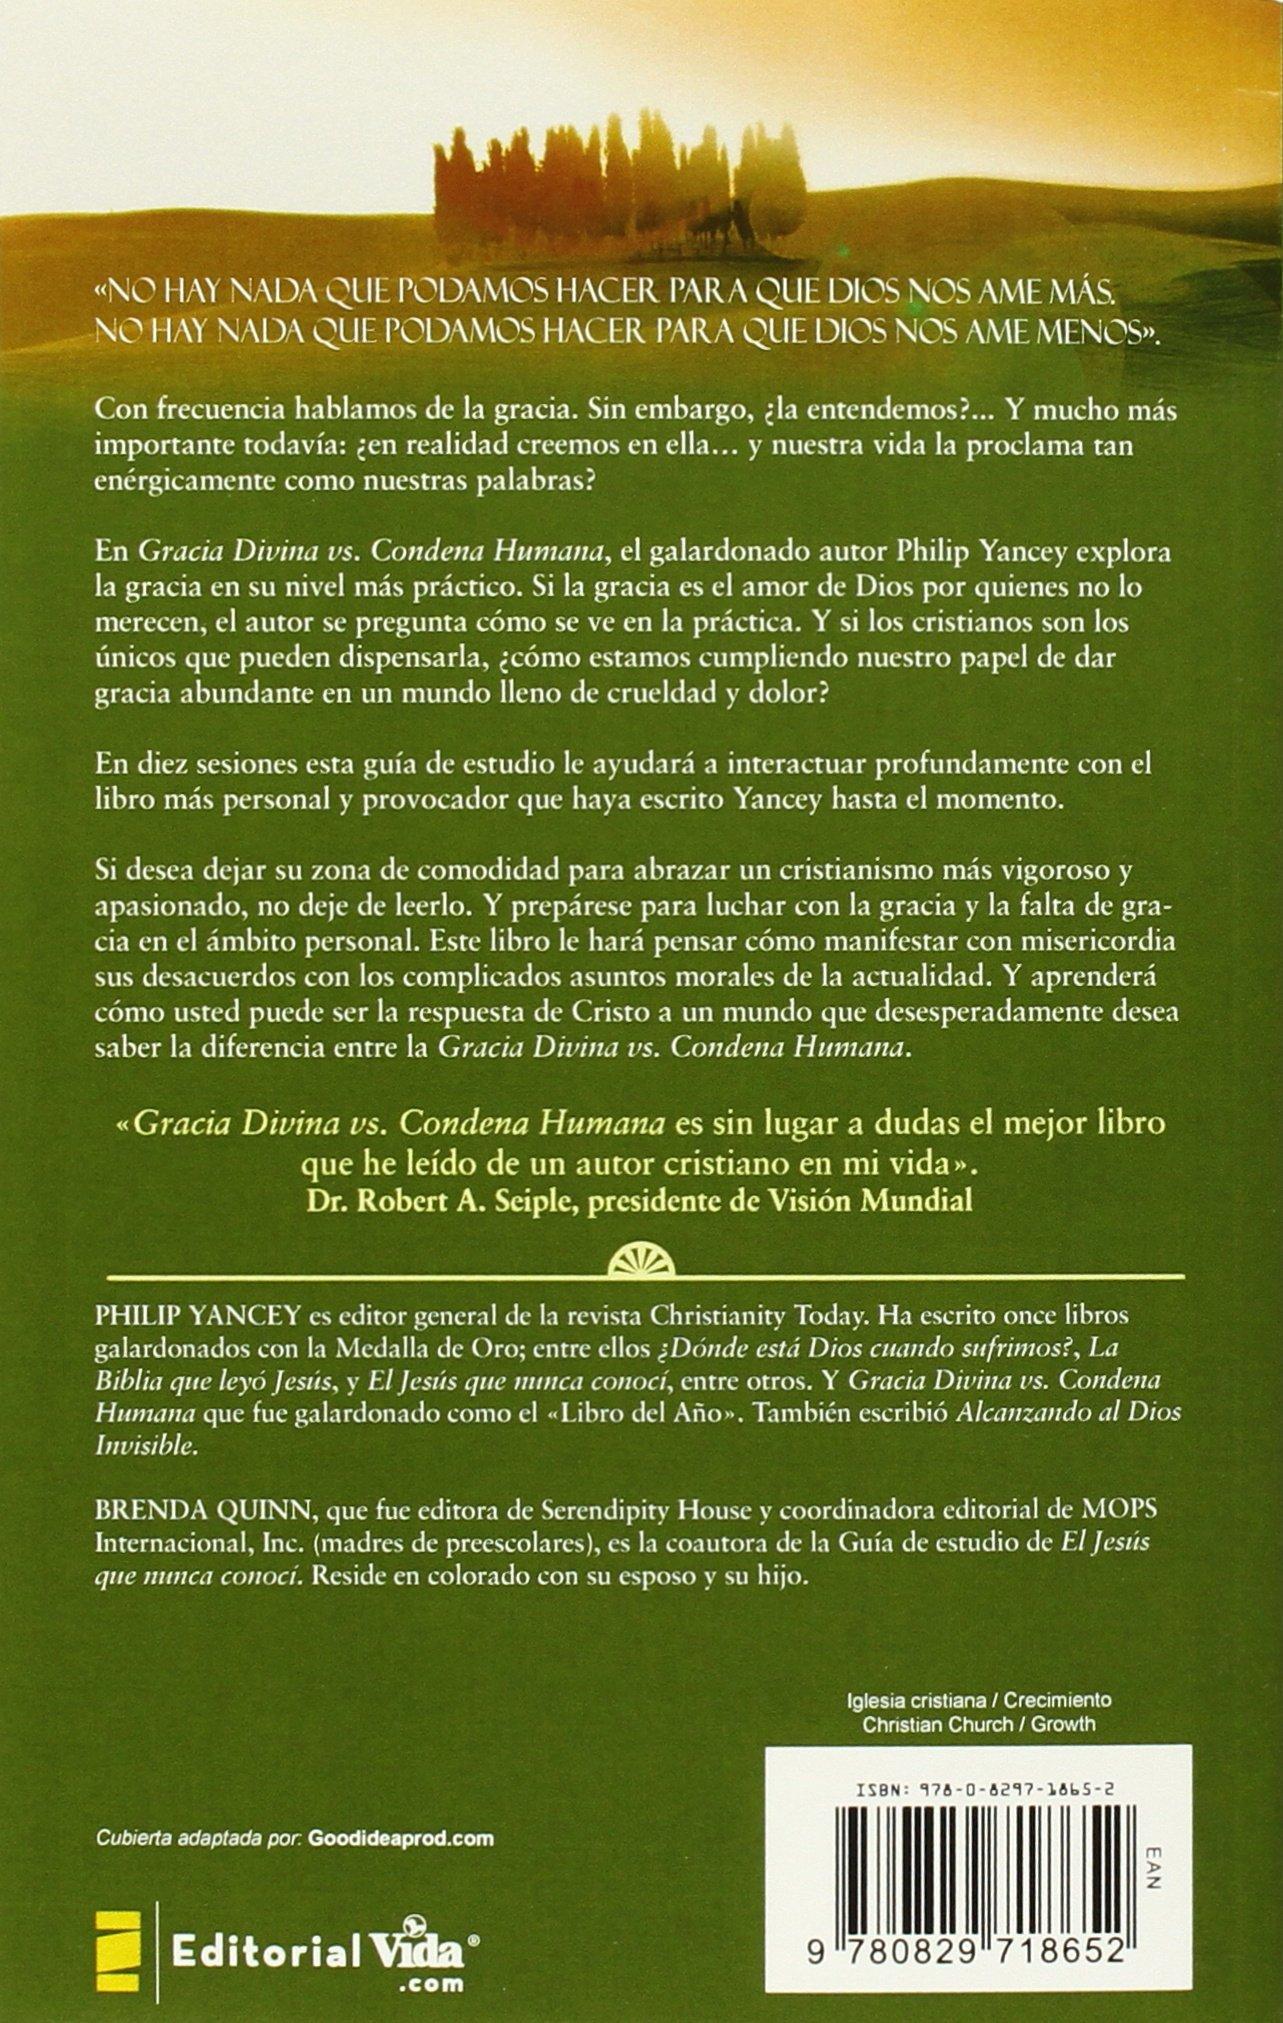 Gracia divina vs. condena humana: Philip Yancey: 9780829718652: Amazon.com: Books